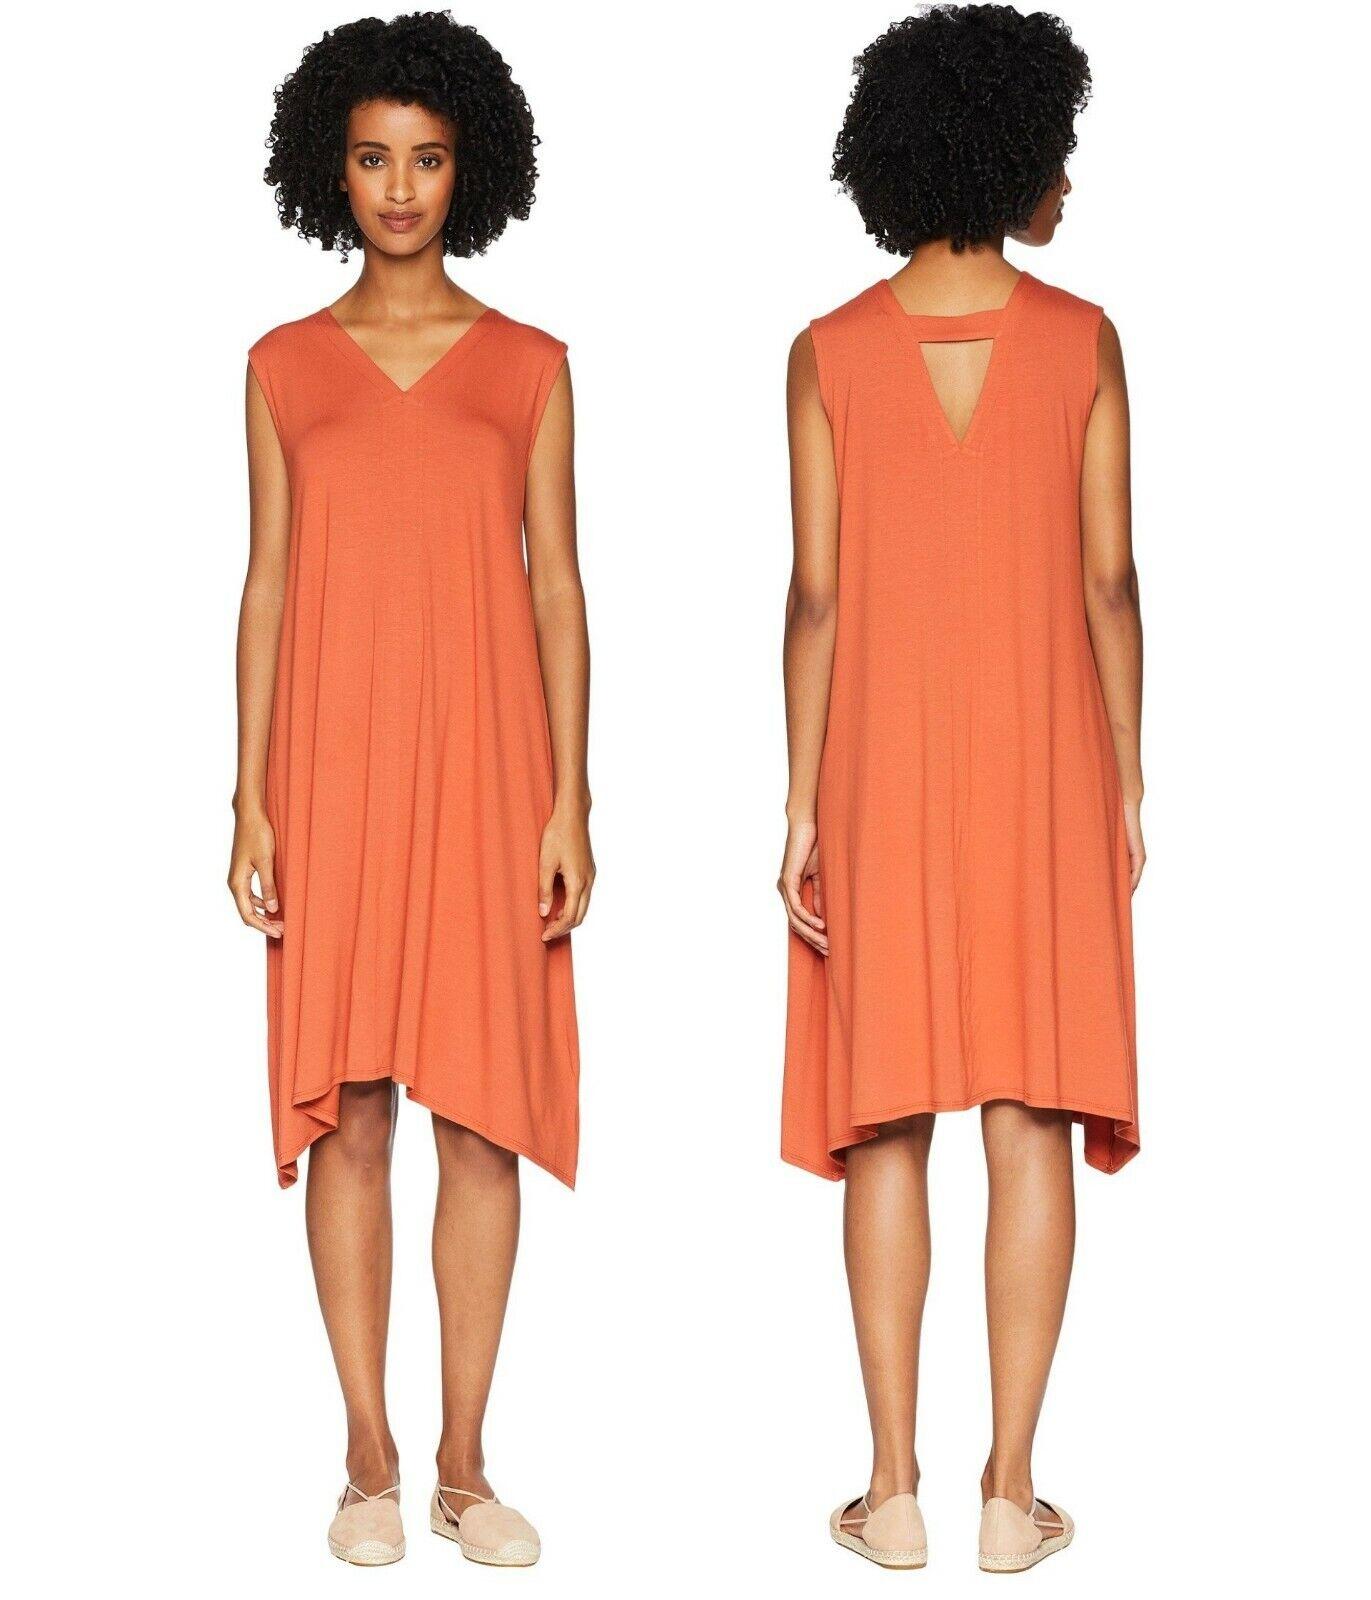 178 Eileen Fisher Naranja Pekoe cortar ligero Viscosa Jersey  Vestido XS  entrega de rayos